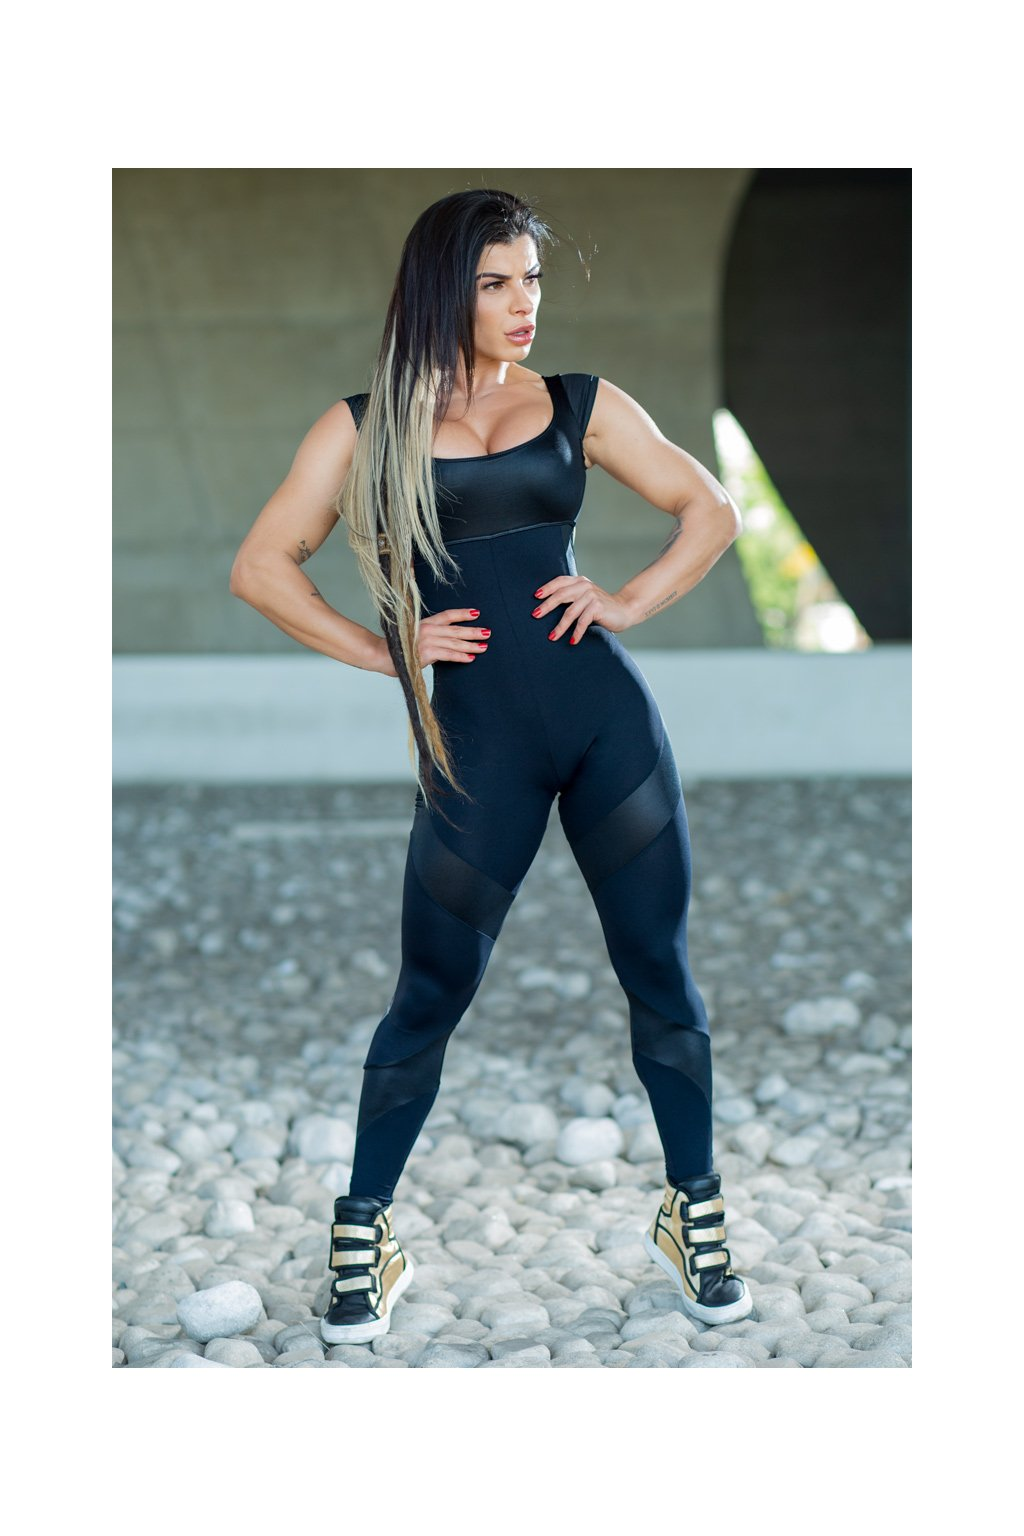 macacao fitness walla dynamite 123507 800x1200